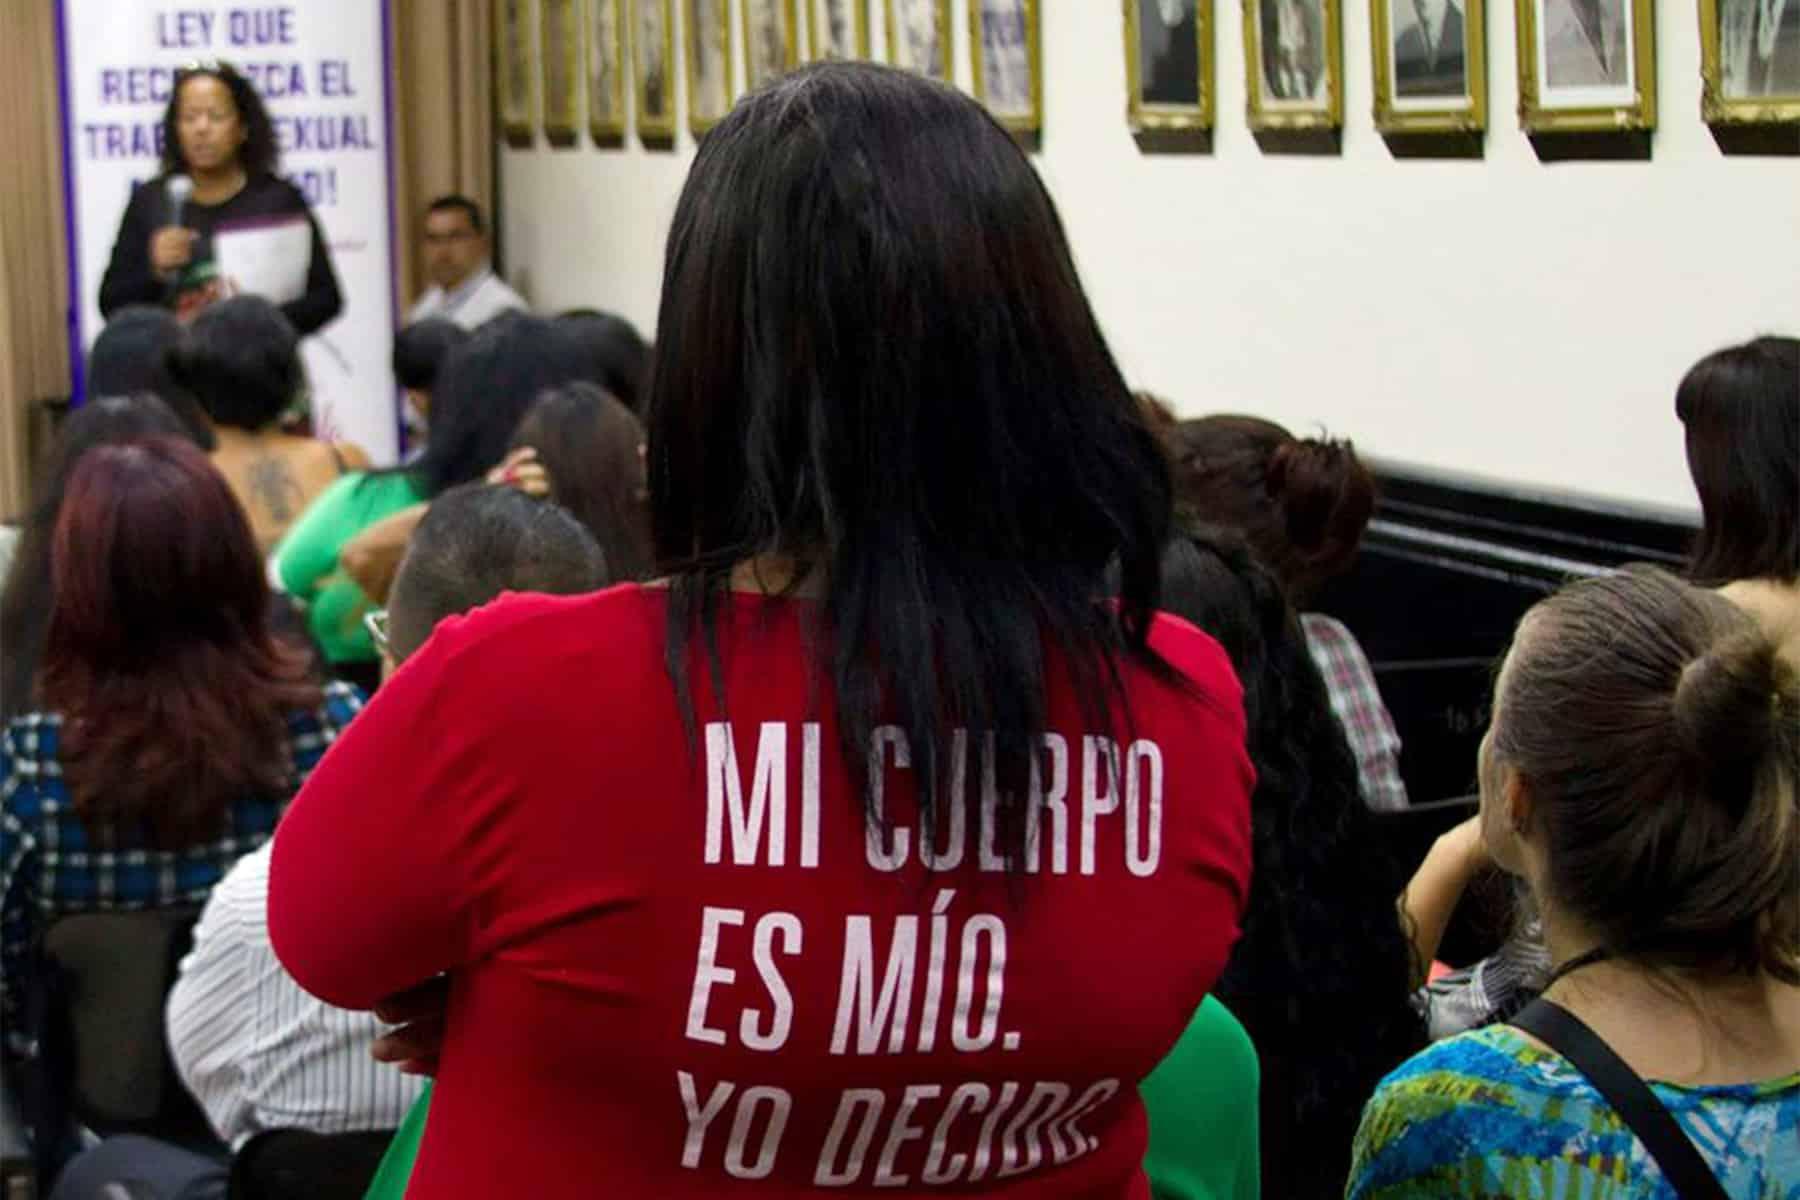 Asociación La Sala meeting at the Legislative Assembly - June 2 2015